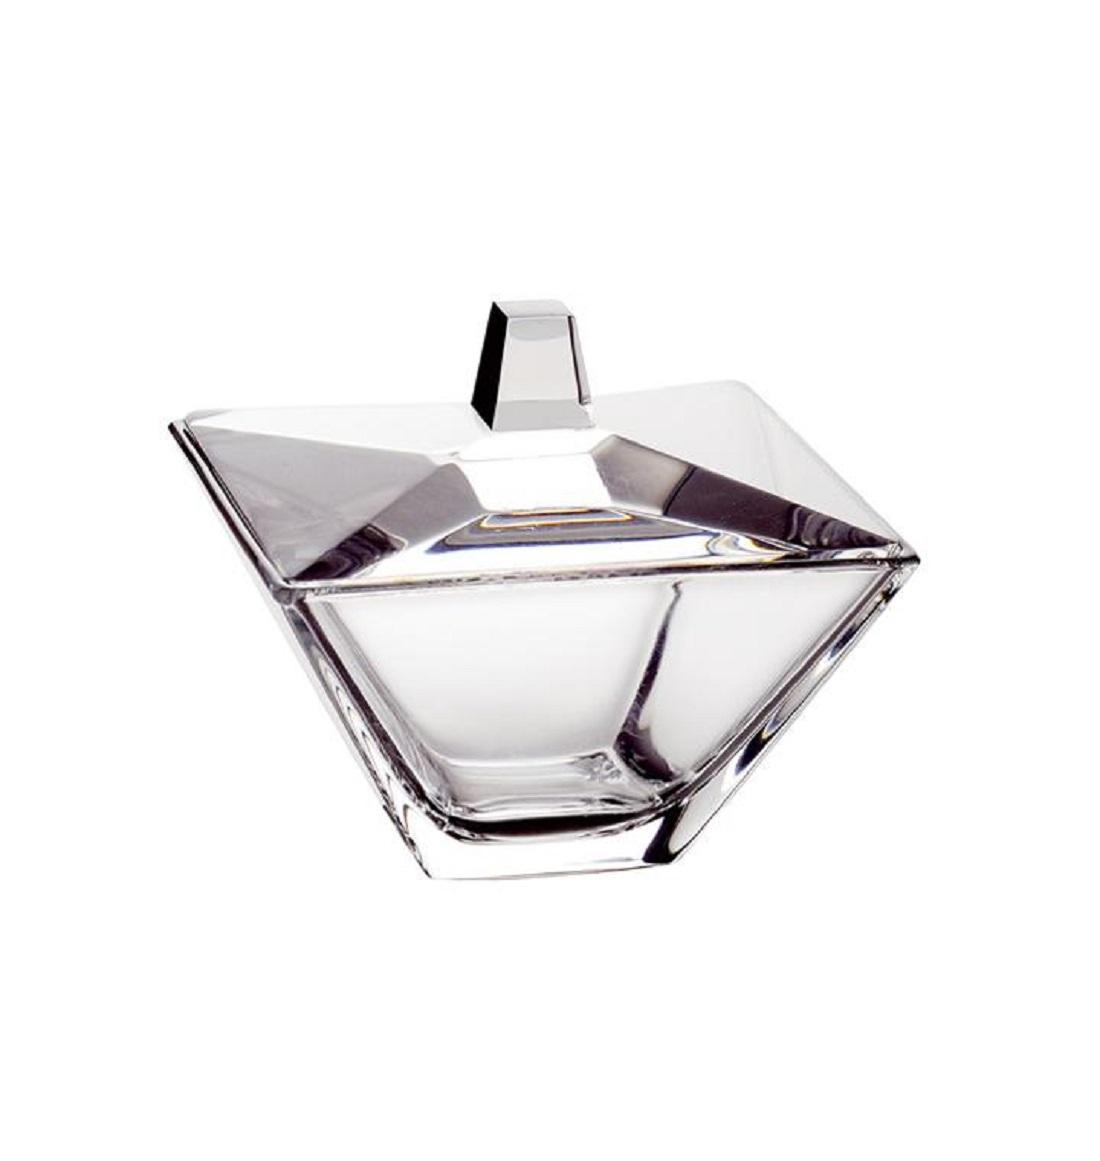 Онлайн каталог PROMENU: Конфетница с крышкой Vidivi TORCELLO, 14х14х12,5 см, стекло, прозрачный                               62970EM